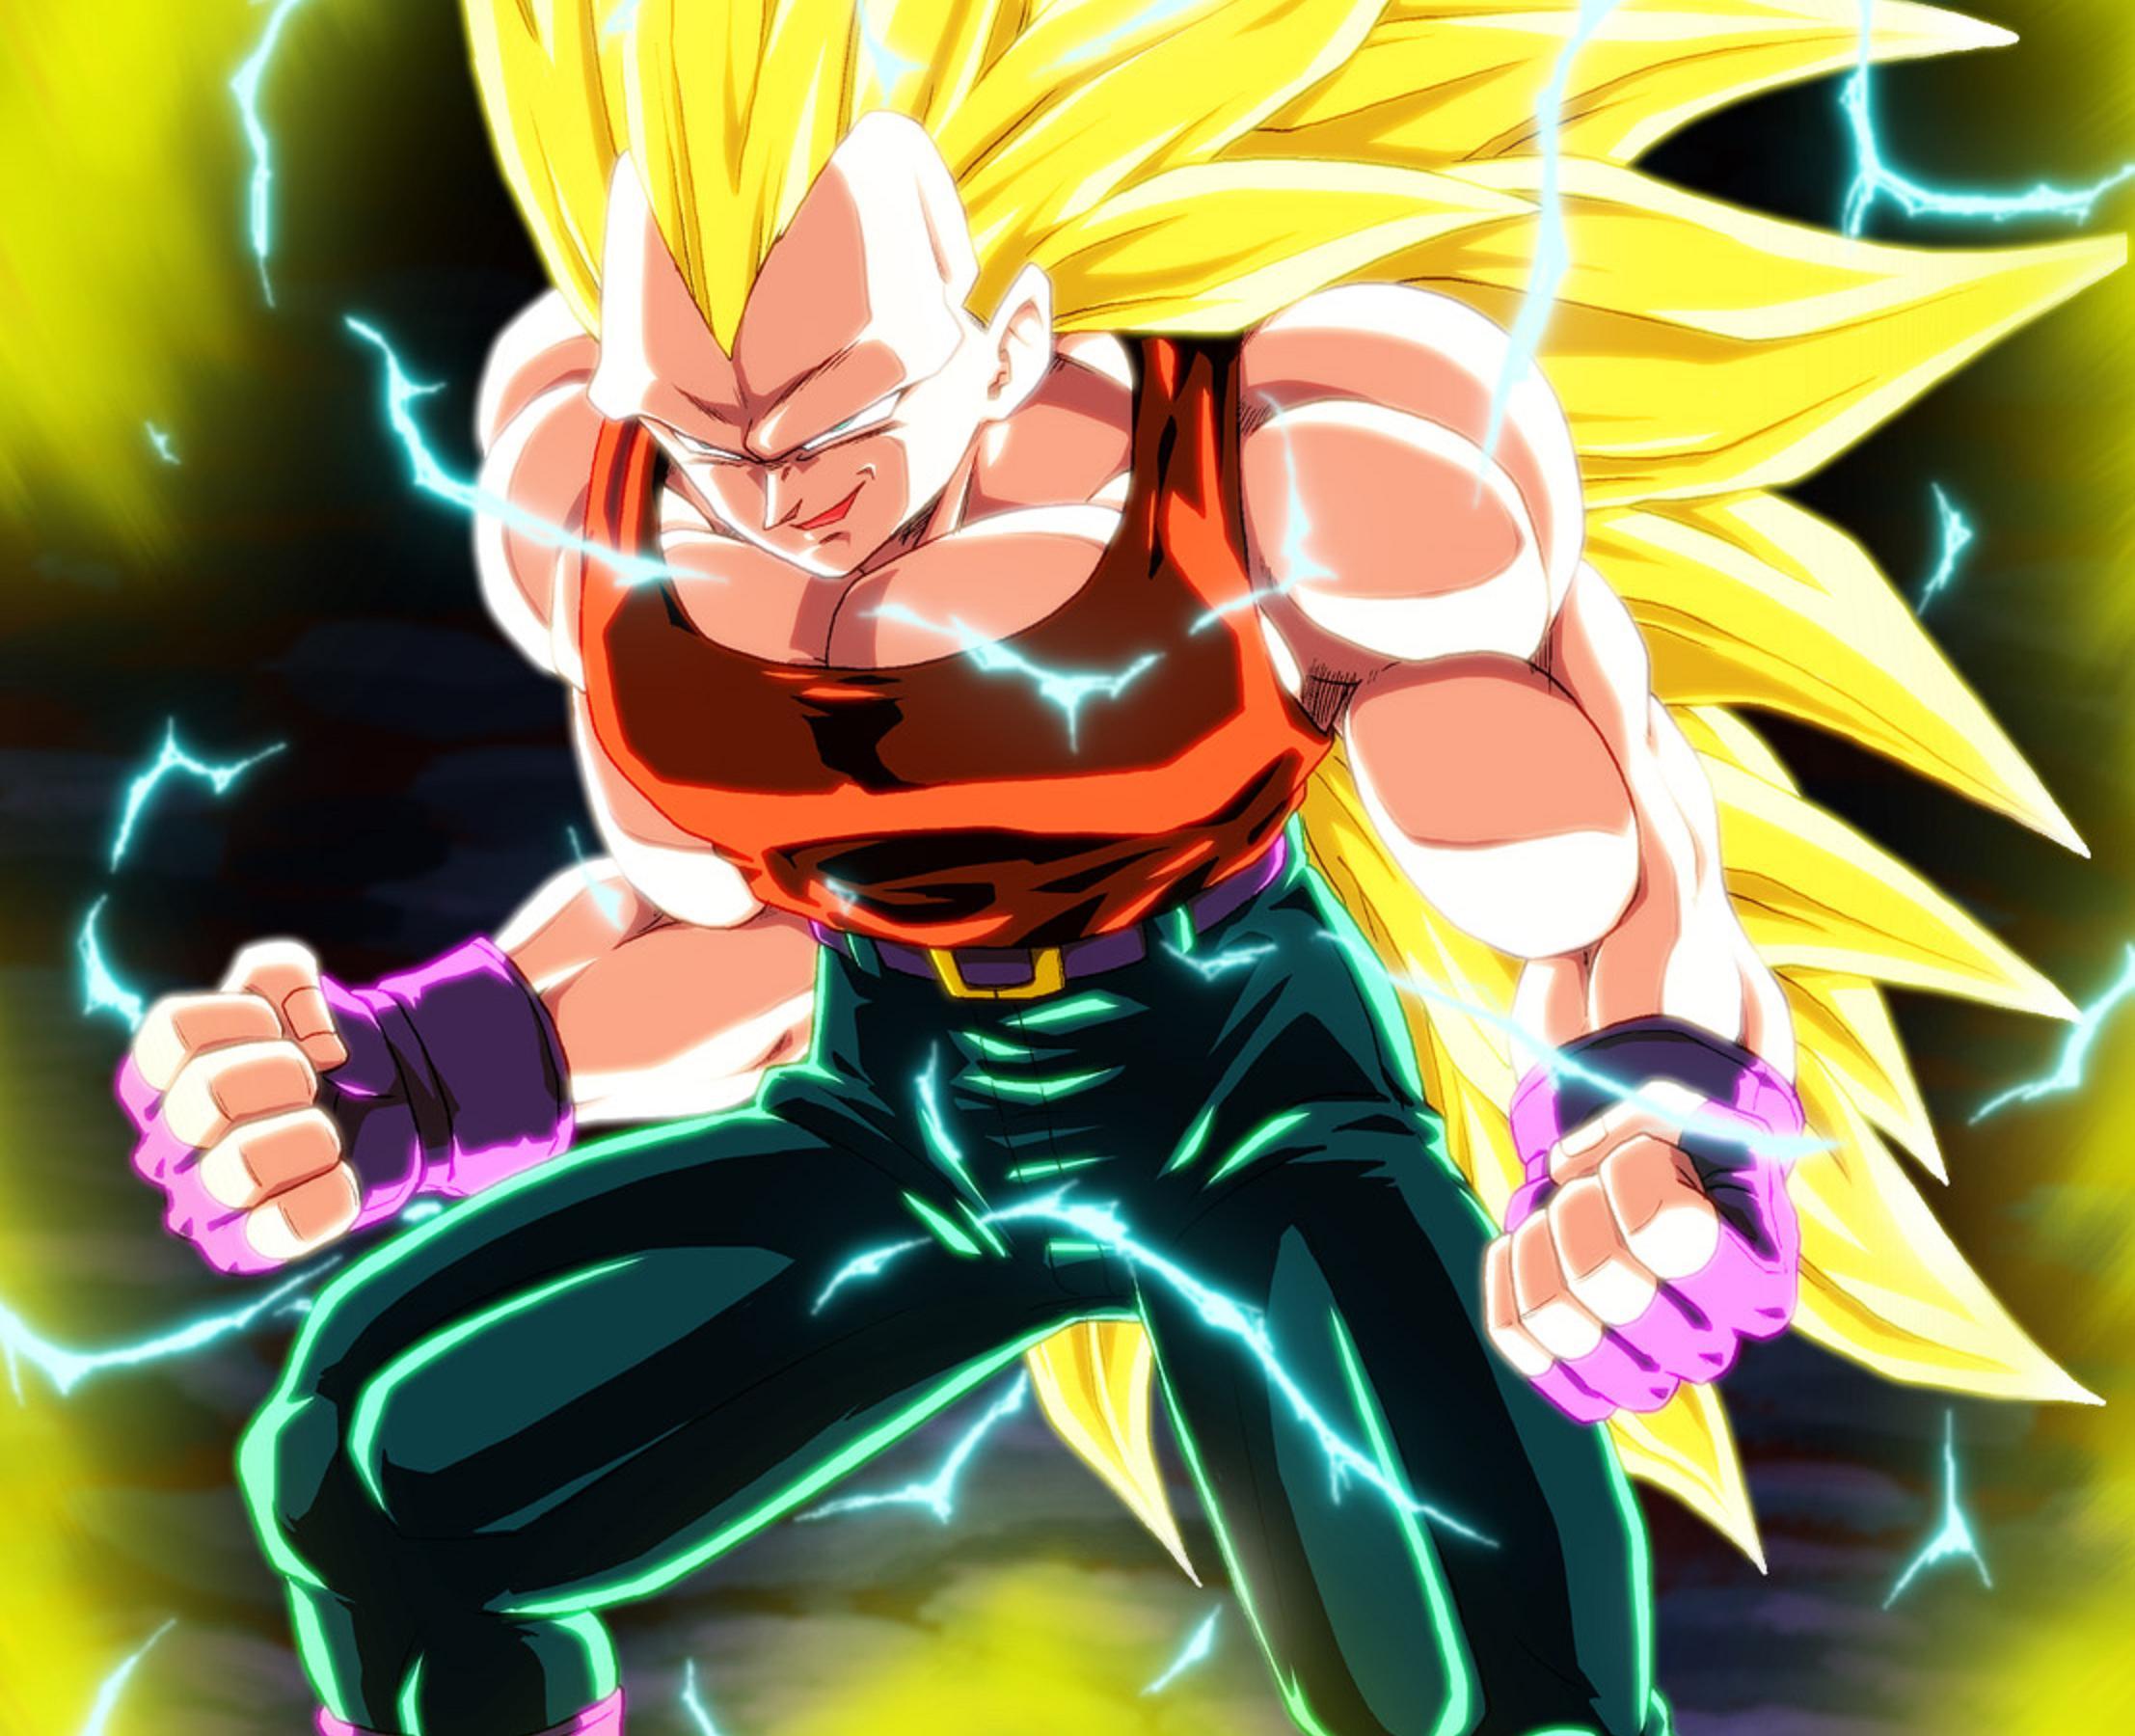 Image Super Saiyan 3 Vegetajpg Dragon Ball Af Fanon Wiki